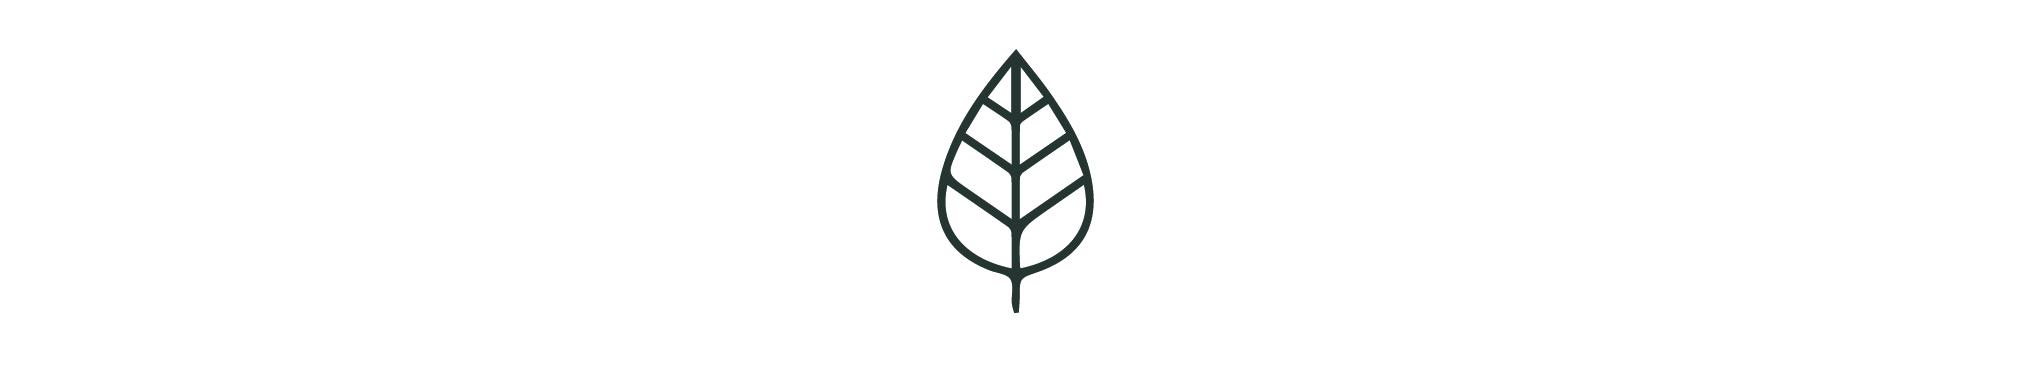 wildcrafted logo-01.jpg